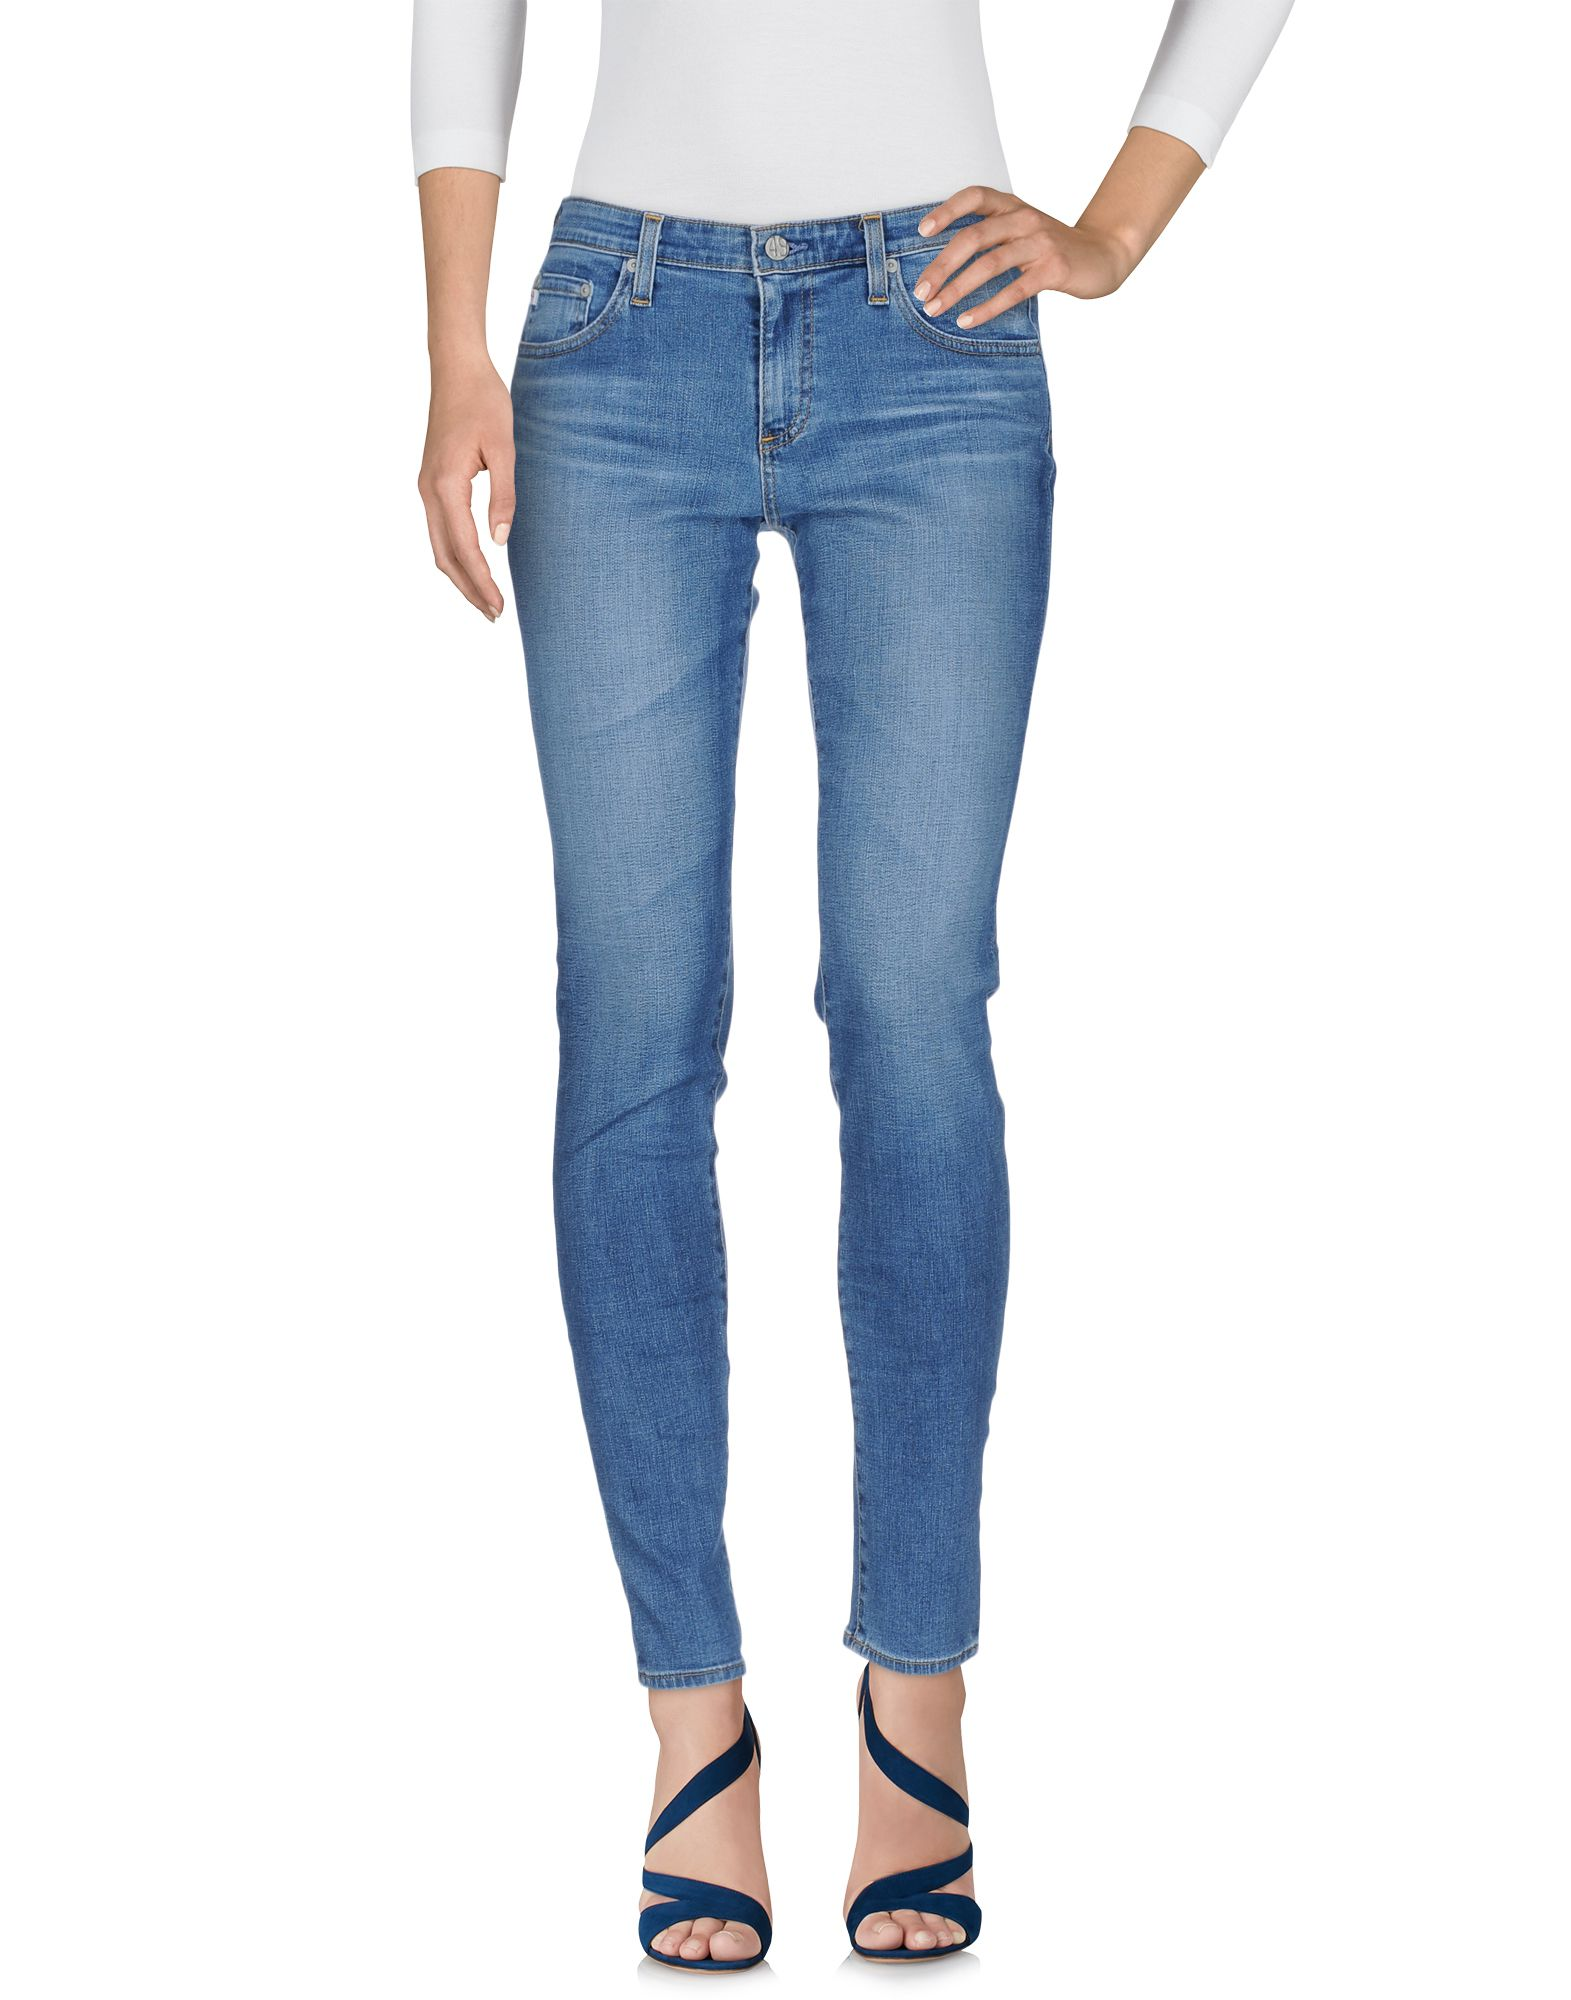 AG ADRIANO GOLDSCHMIED Damen Jeanshose Farbe Blau Größe 7